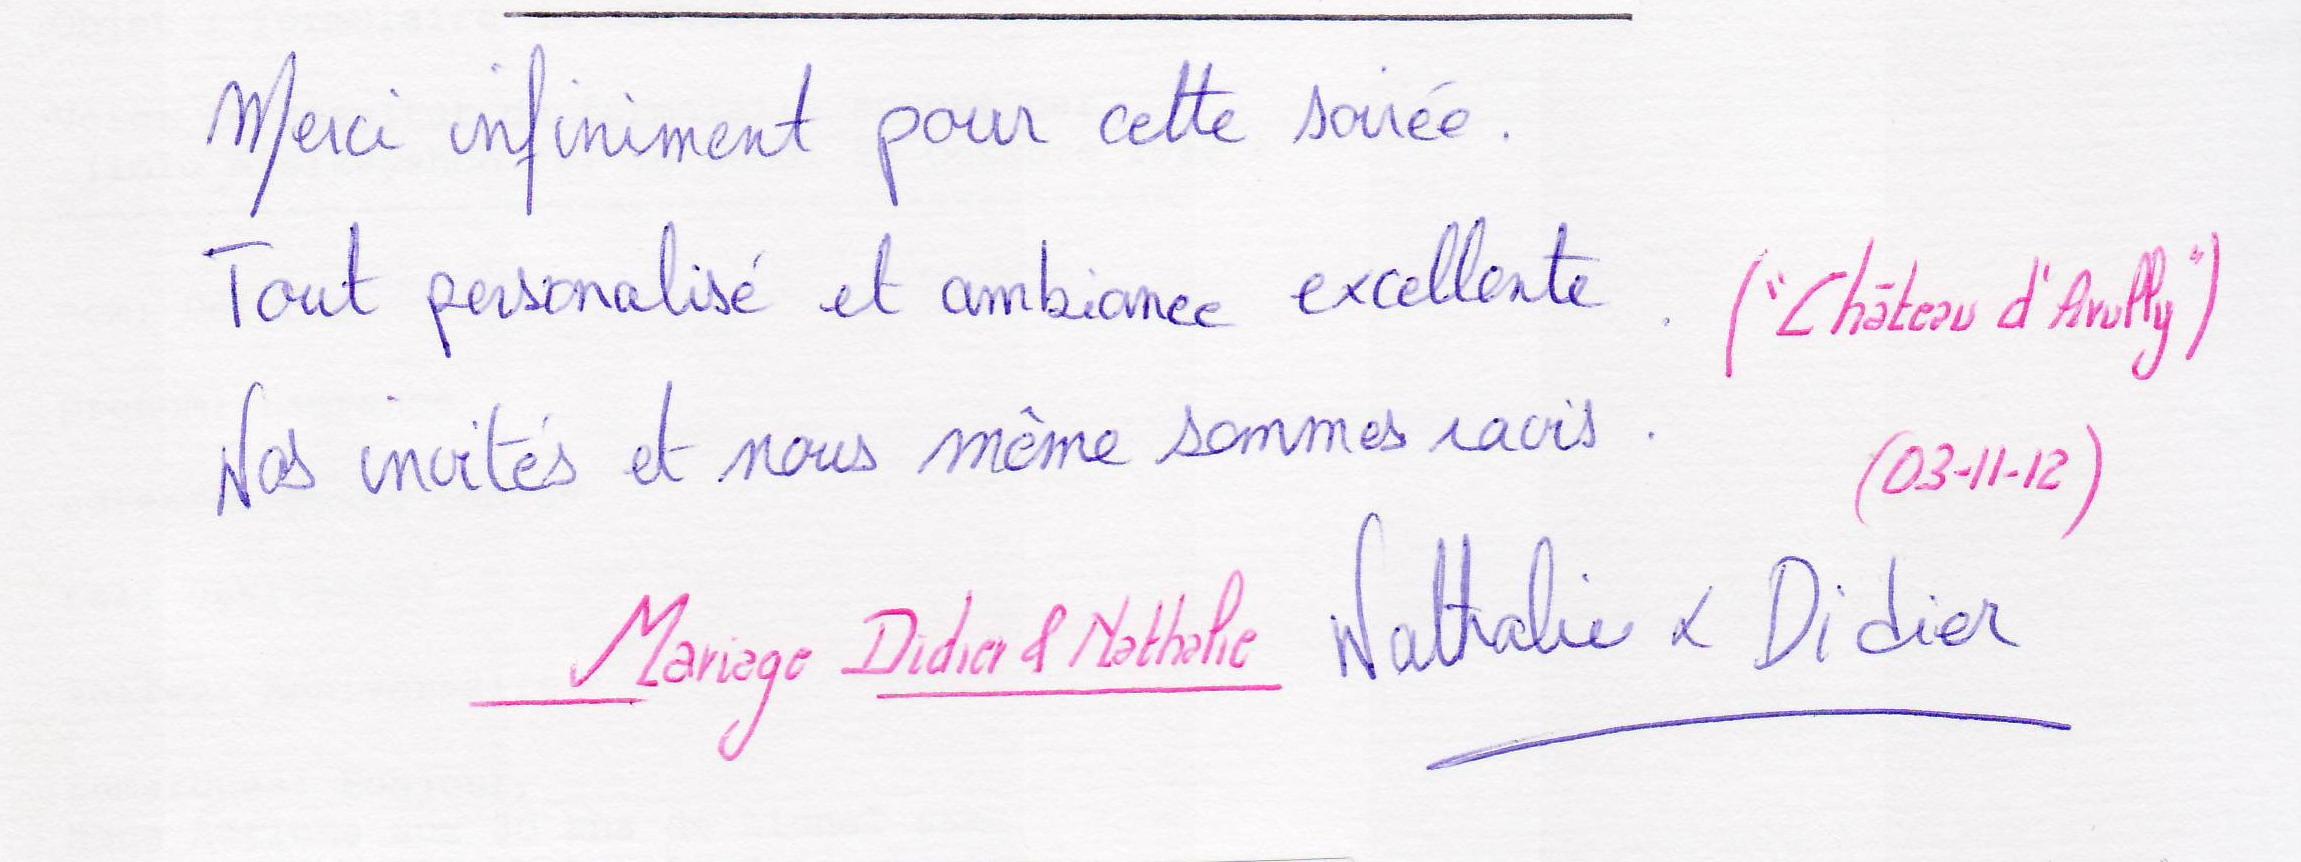 Mariage_MICHEL_Didier_&_Nathalie_(Château_d'Avully)_(03-11-2012)